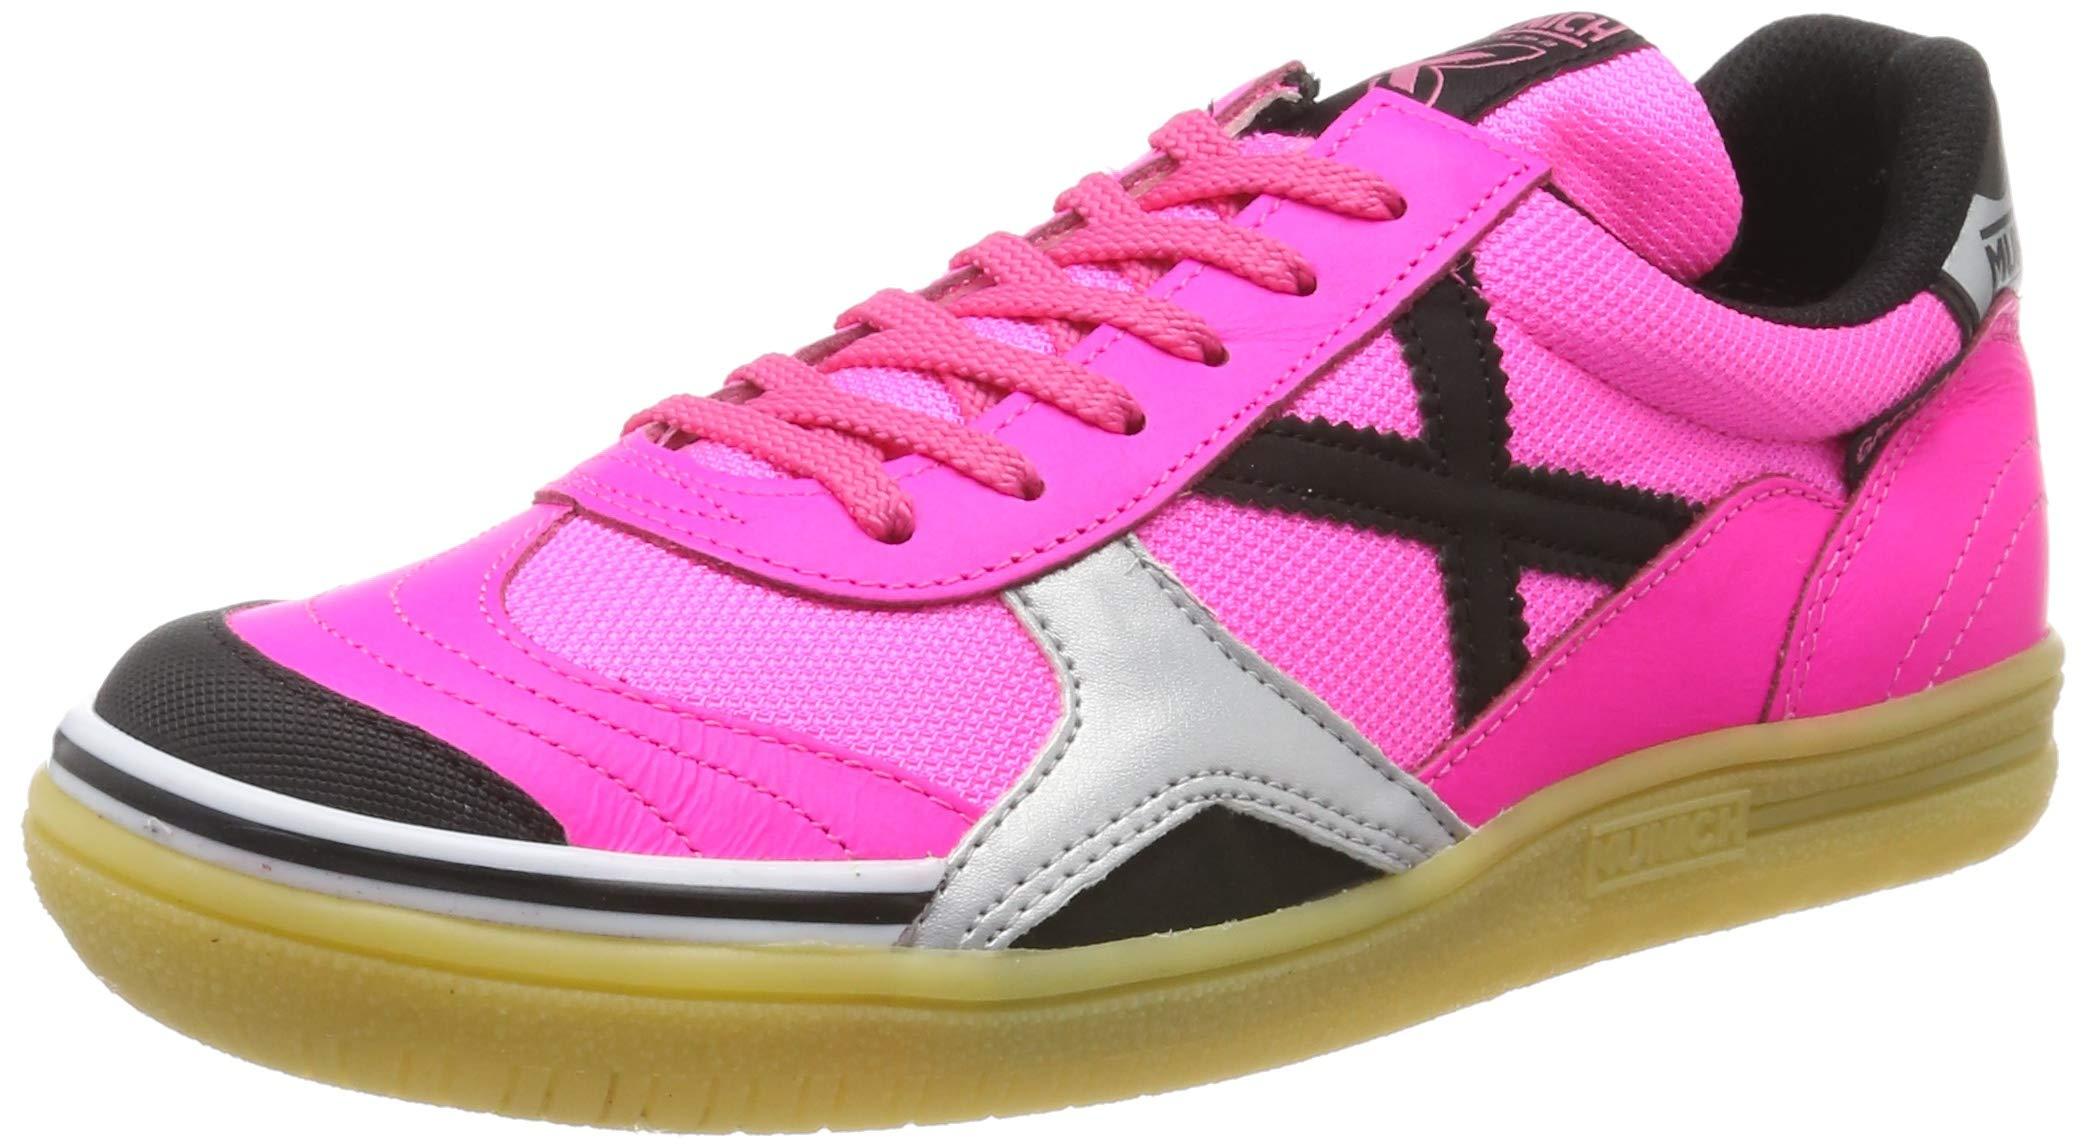 De Eu Gresca Fitness AdulteRoserosa 1440 Mixte Munich Chaussures ukXZPi